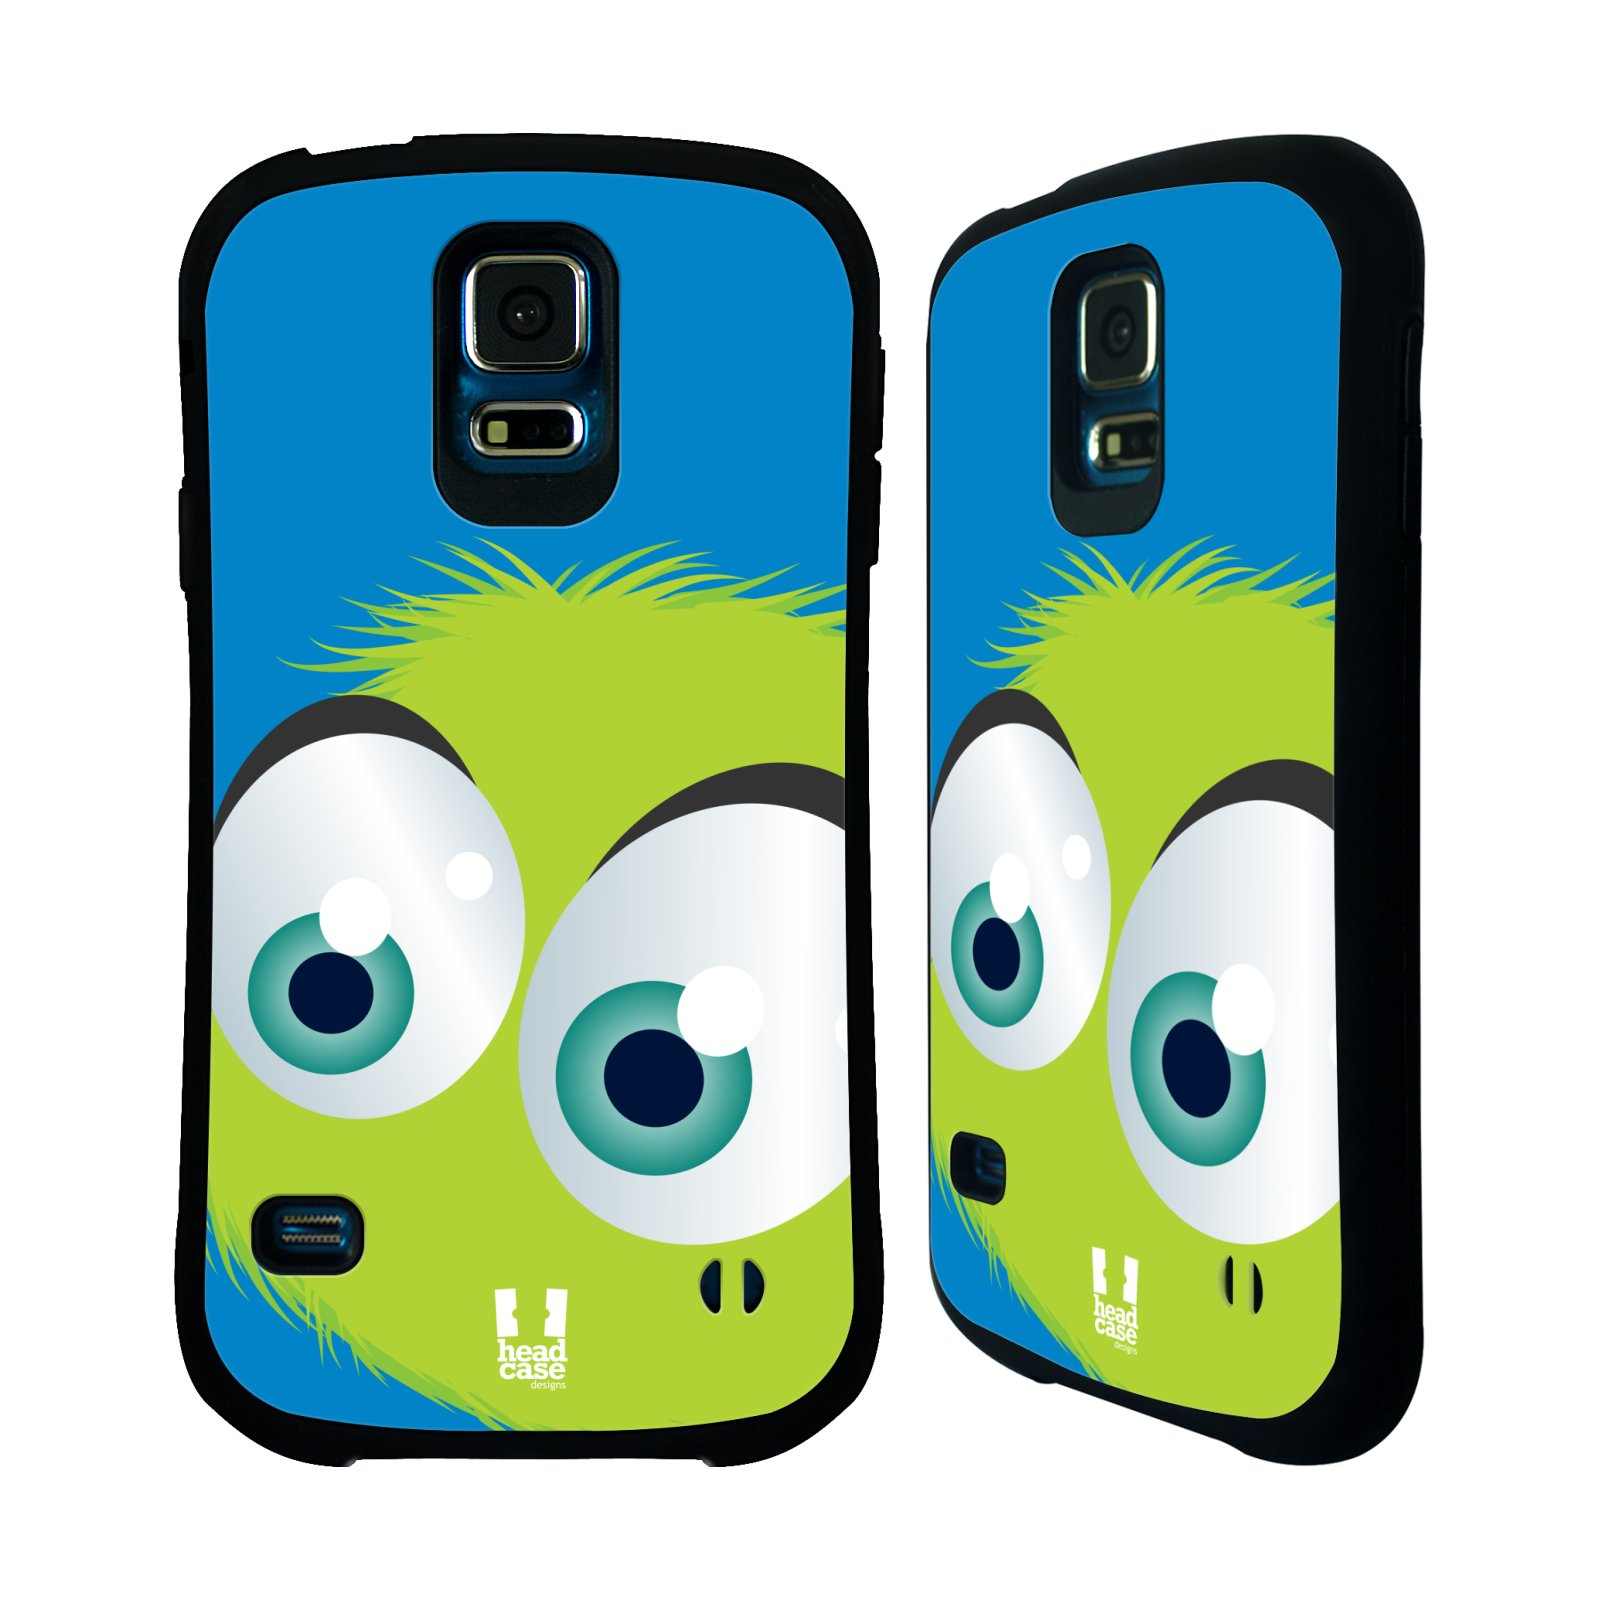 Nárazuvzdorné pouzdro na mobil Samsung Galaxy S5 HEAD CASE FUZÍK ZELENÝ (Odolný nárazuvzdorný silikonový kryt či obal na mobilní telefon Samsung Galaxy S5 SM-G900F)